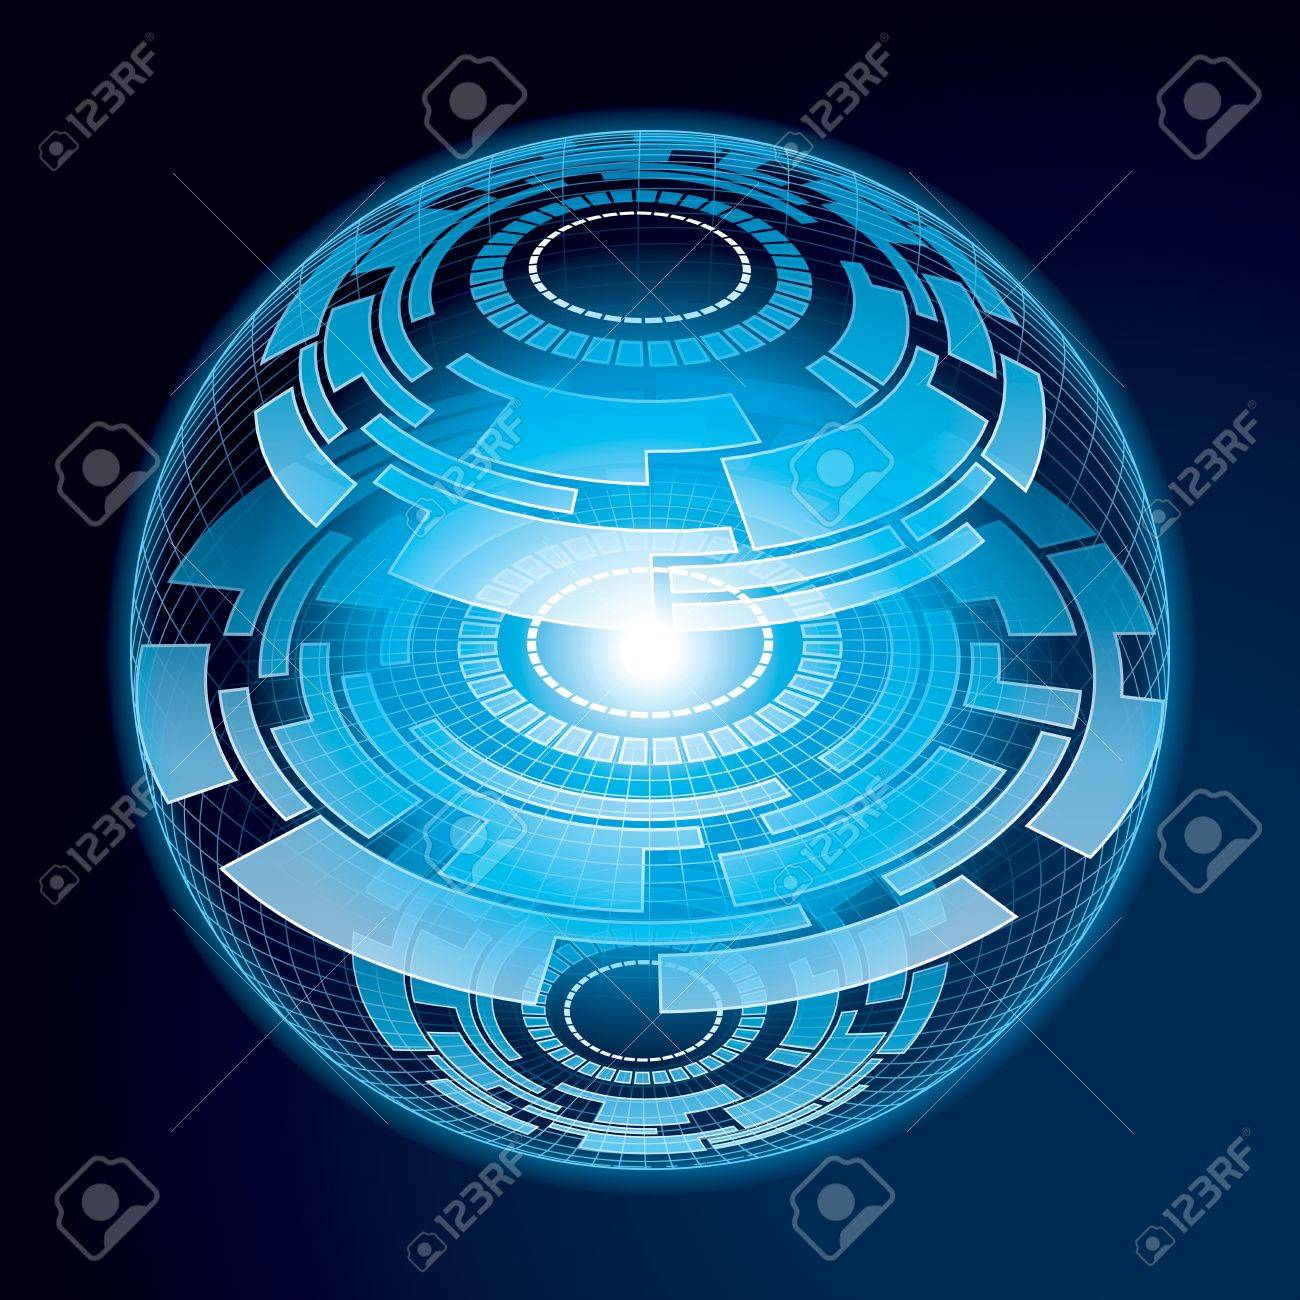 Fantasy Navigation Sphere  Vector Illustration Stock Vector - 21523480